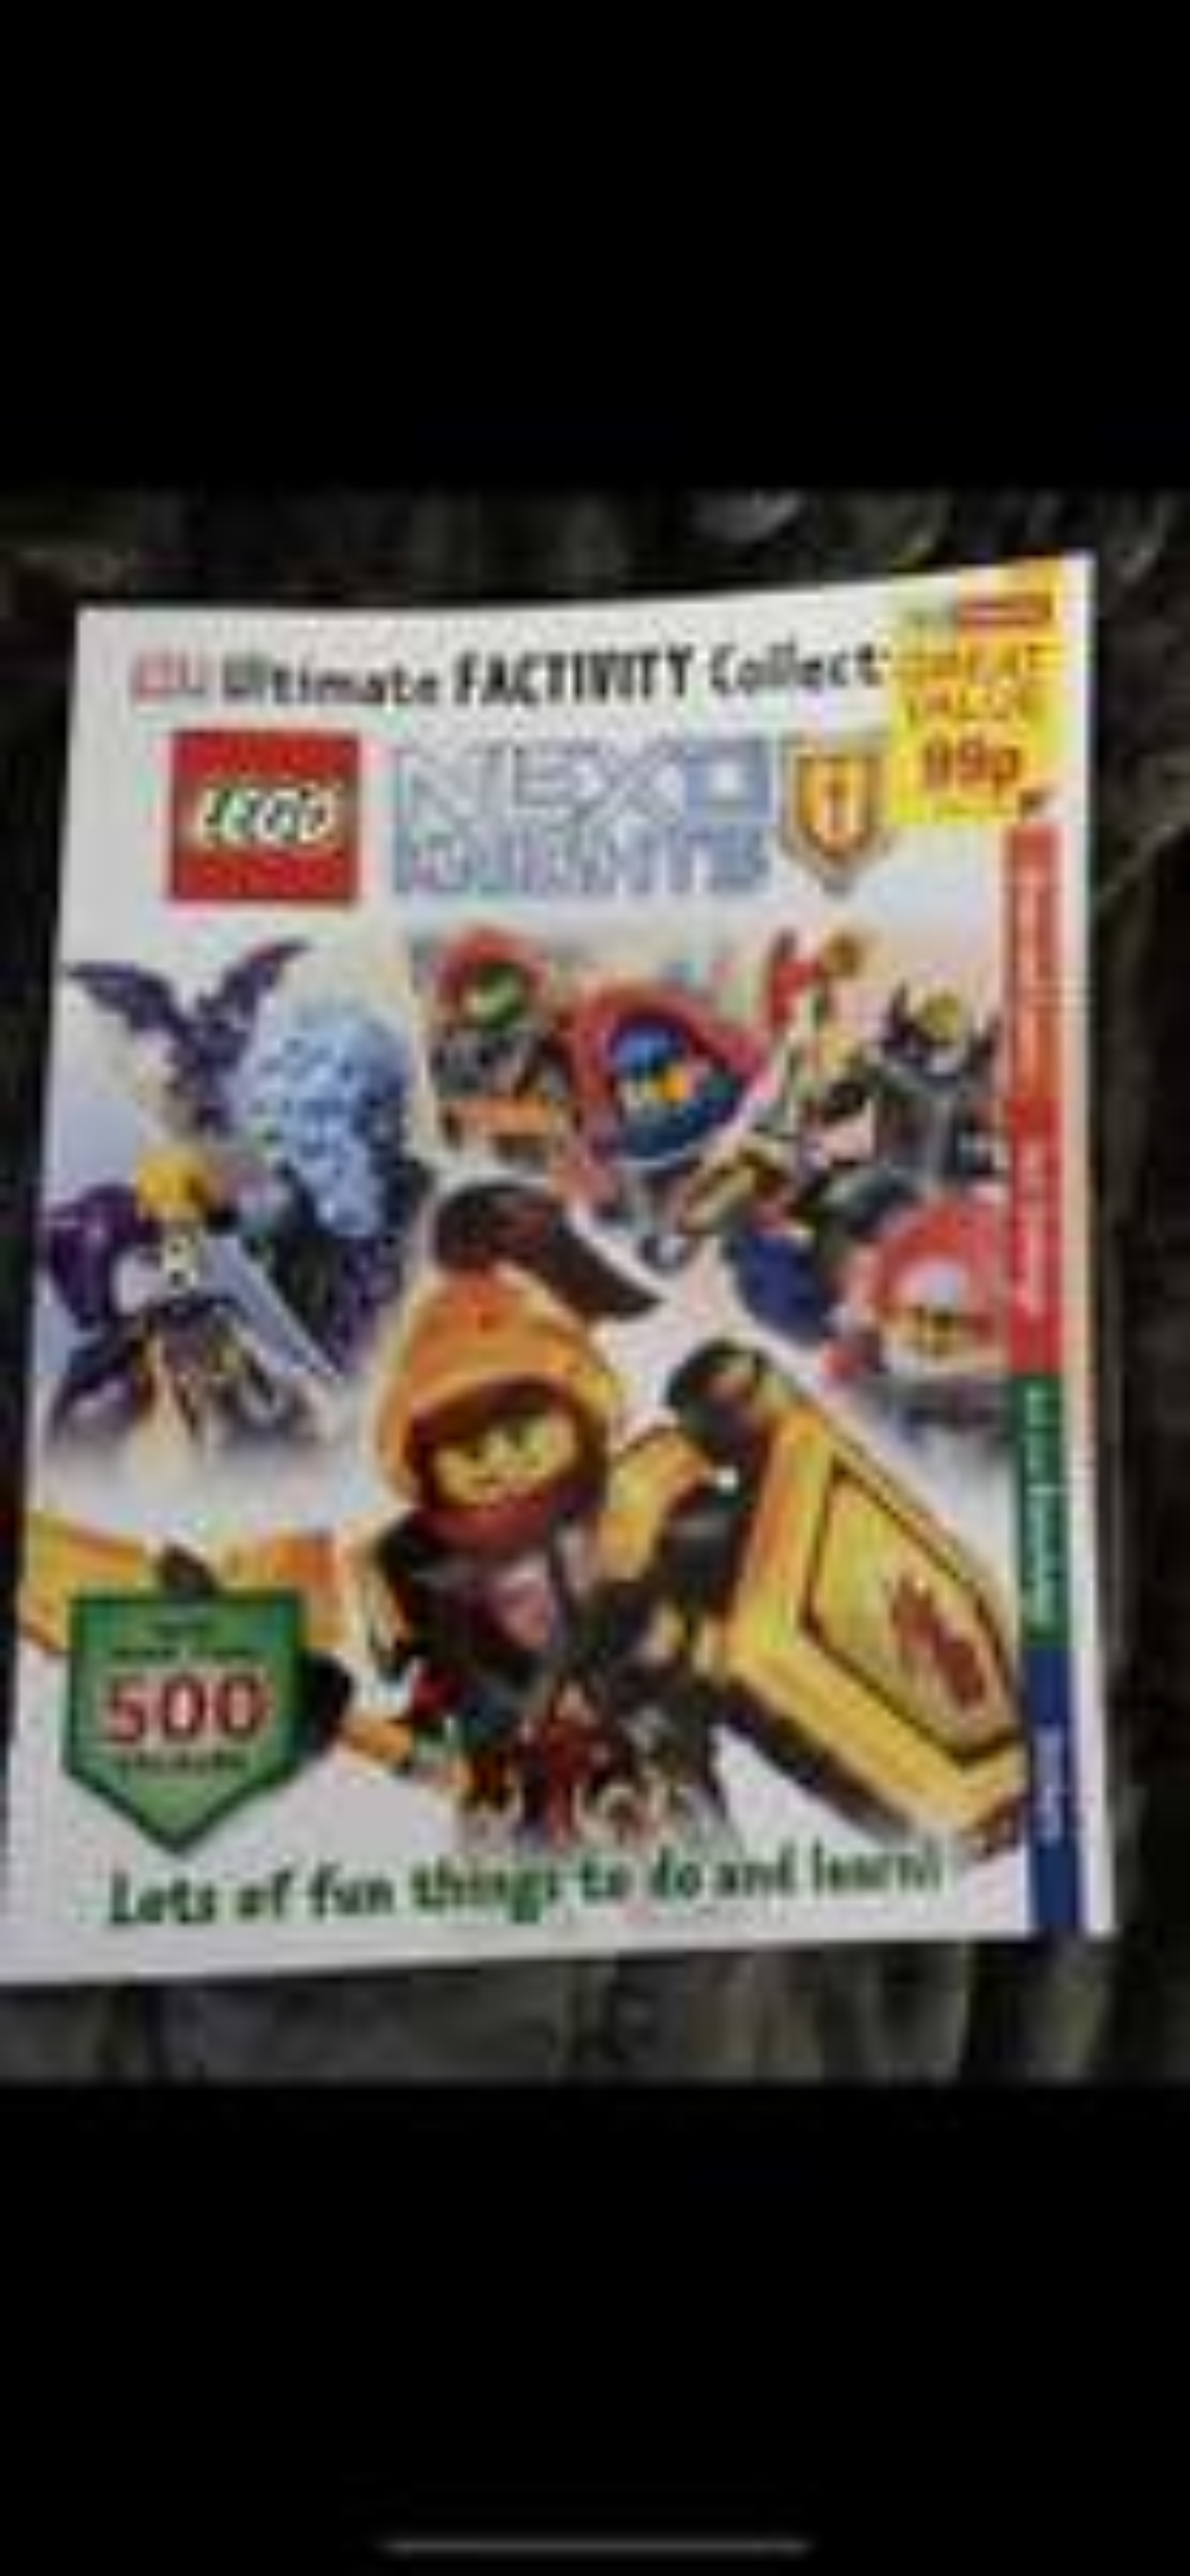 Dk lego nexo knights  book 99p - Home Bargains